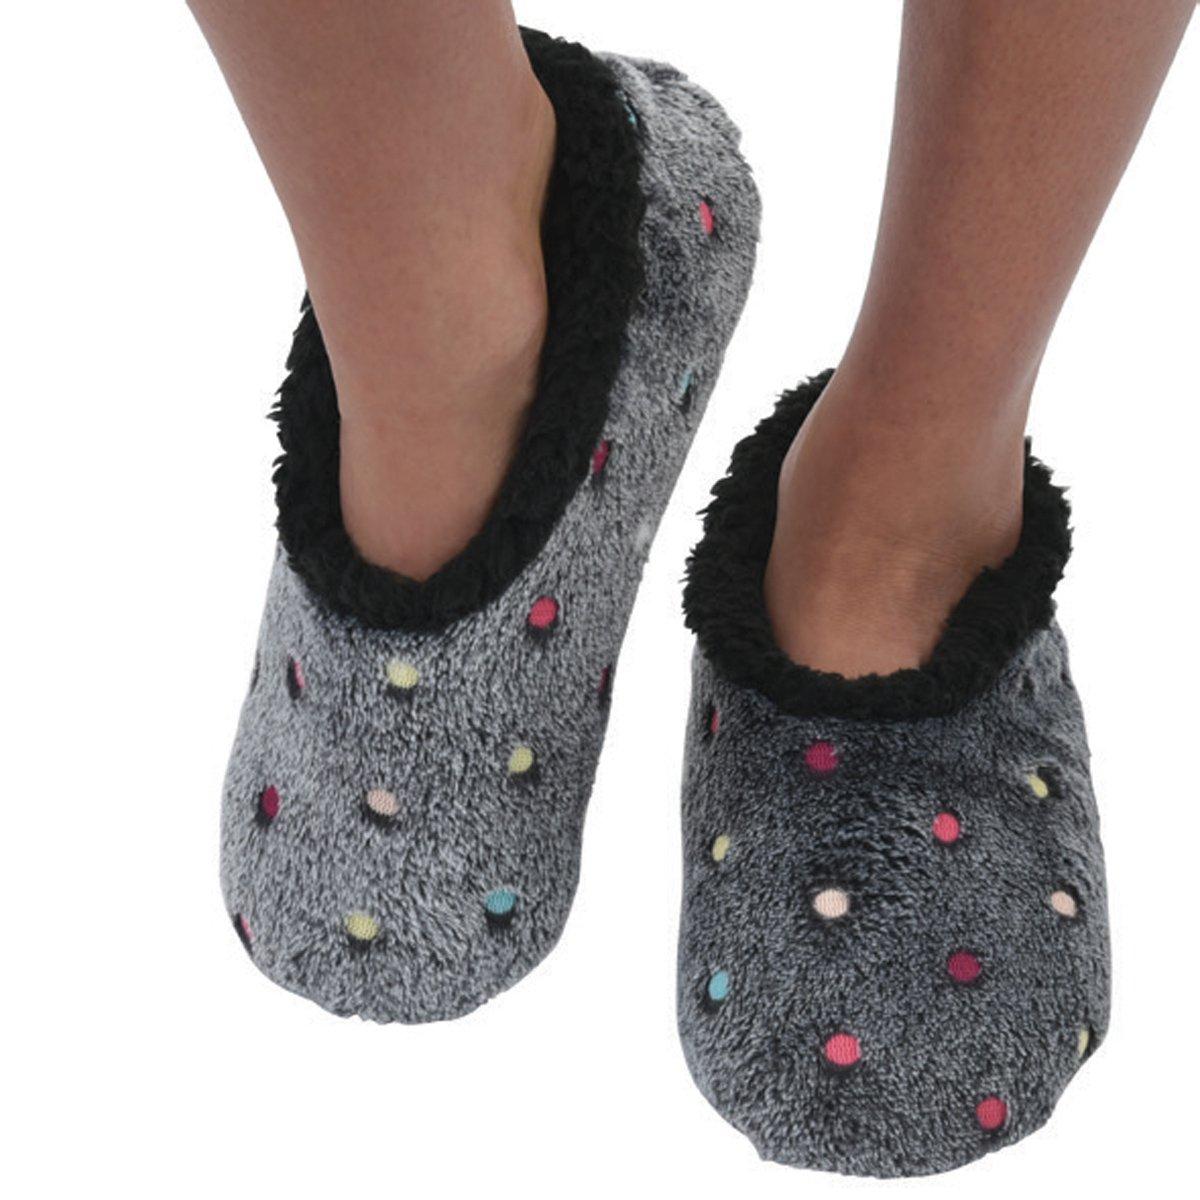 Snoozies Womens Lotsa Dots Colorful Cozy Sherpa Non Skid Slipper Socks - Black, Medium WLD-002-BLACK-MEDIUM